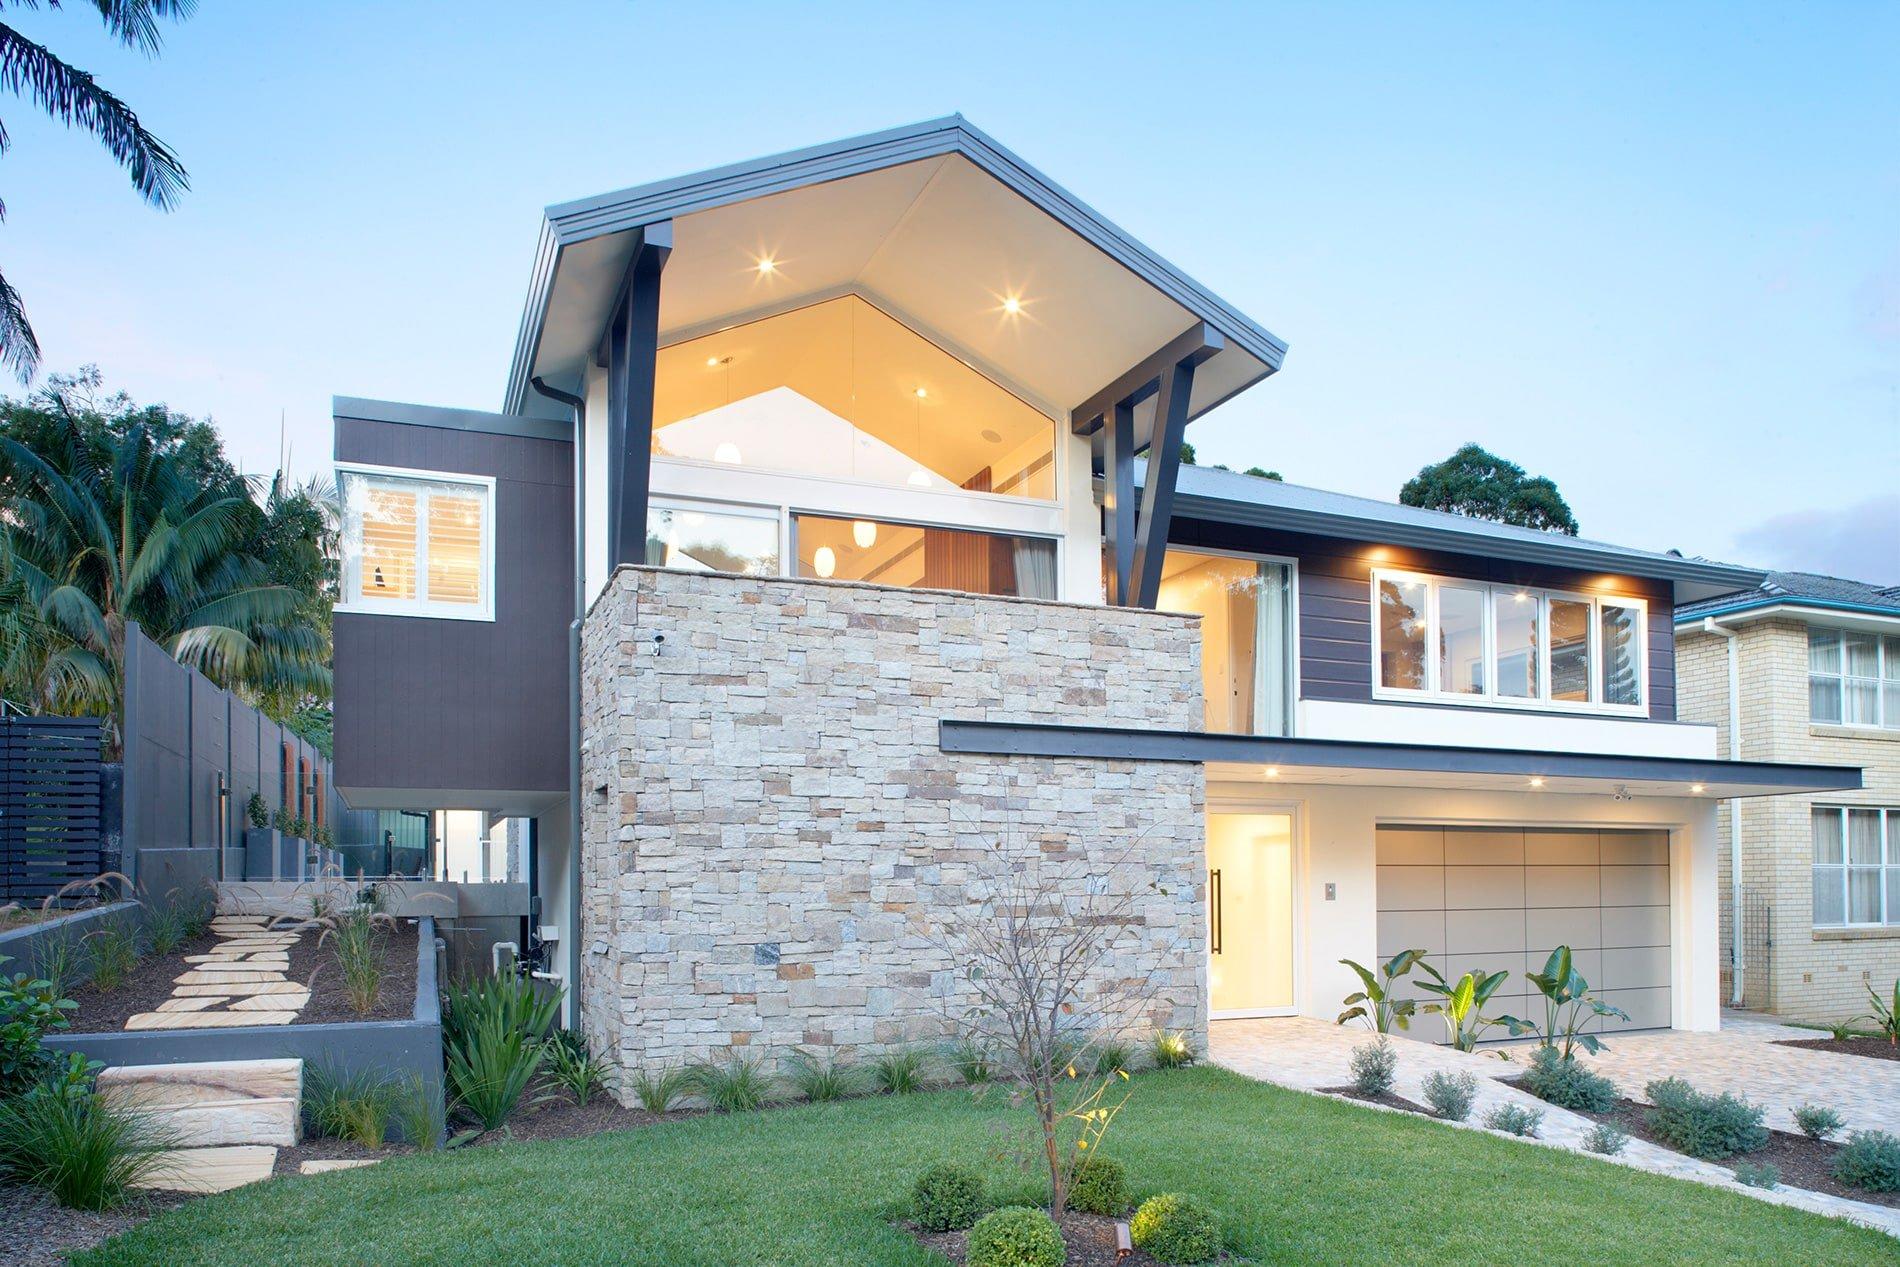 Windcrest Bespoke - Boutique Home Builder Sydney PredictSite